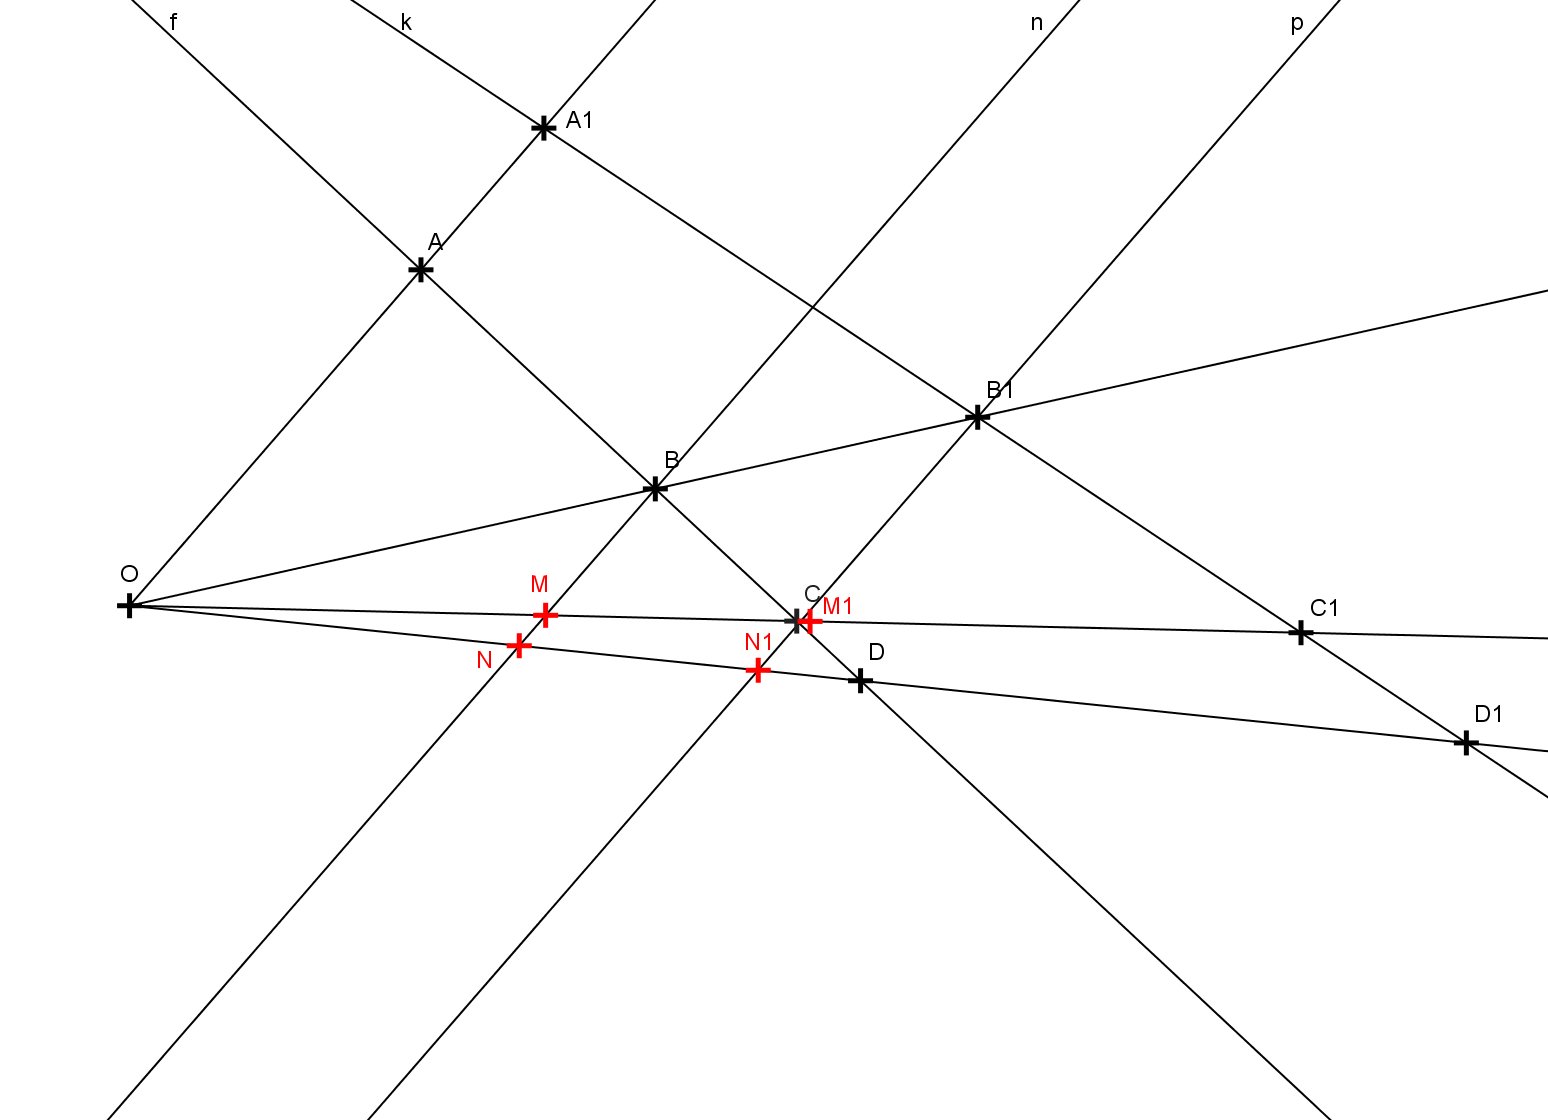 http://forum.matematika.cz/upload3/img/2017-05/62171_podobnost%2Bp%25C5%2599esA.png